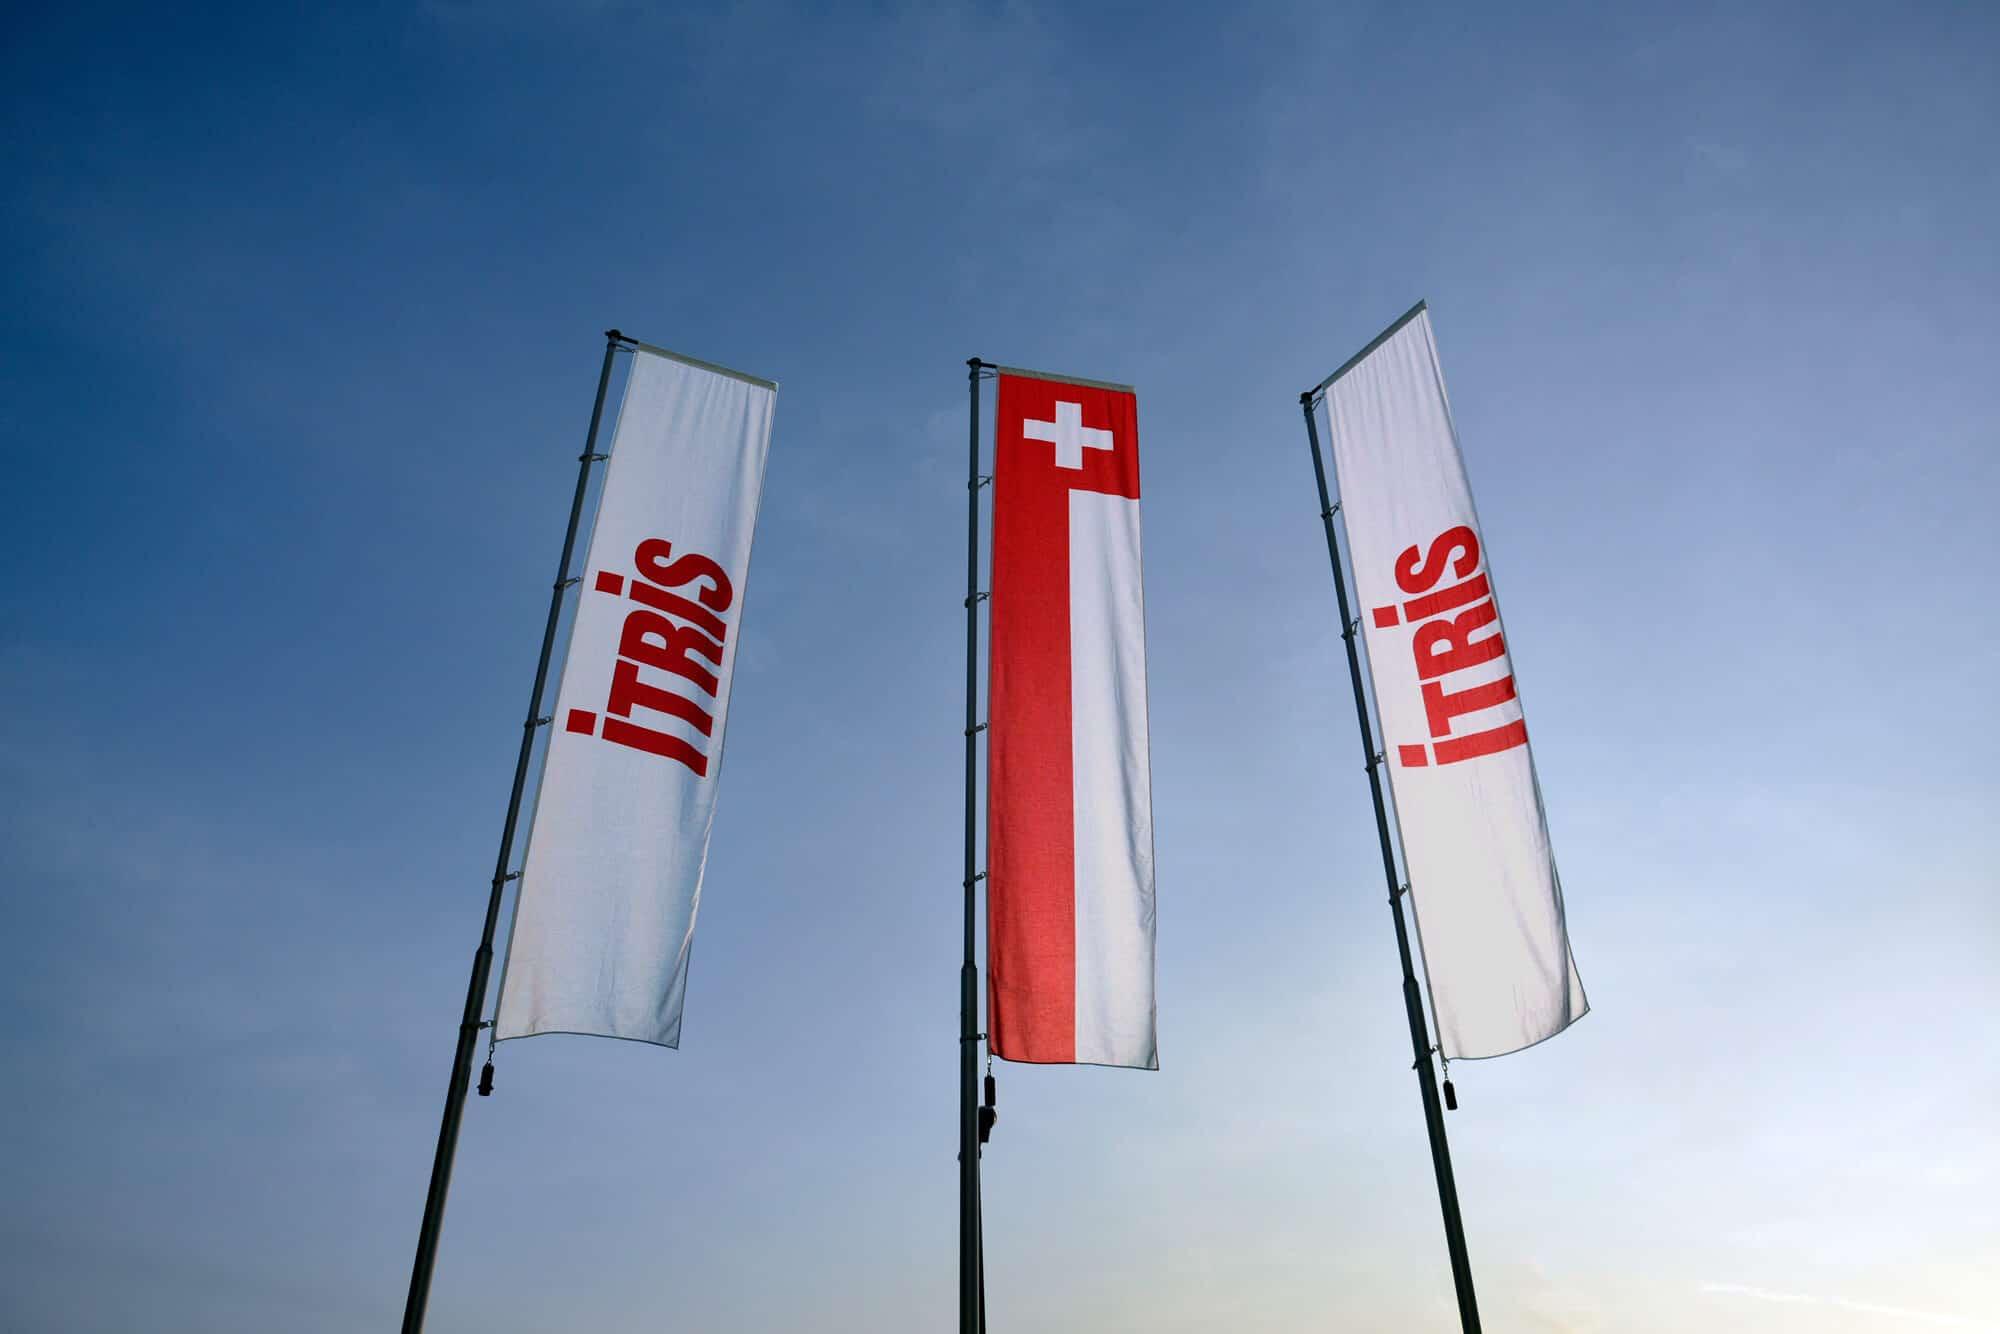 ITRIS Fahnen/Flaggen vor blauem Himmel